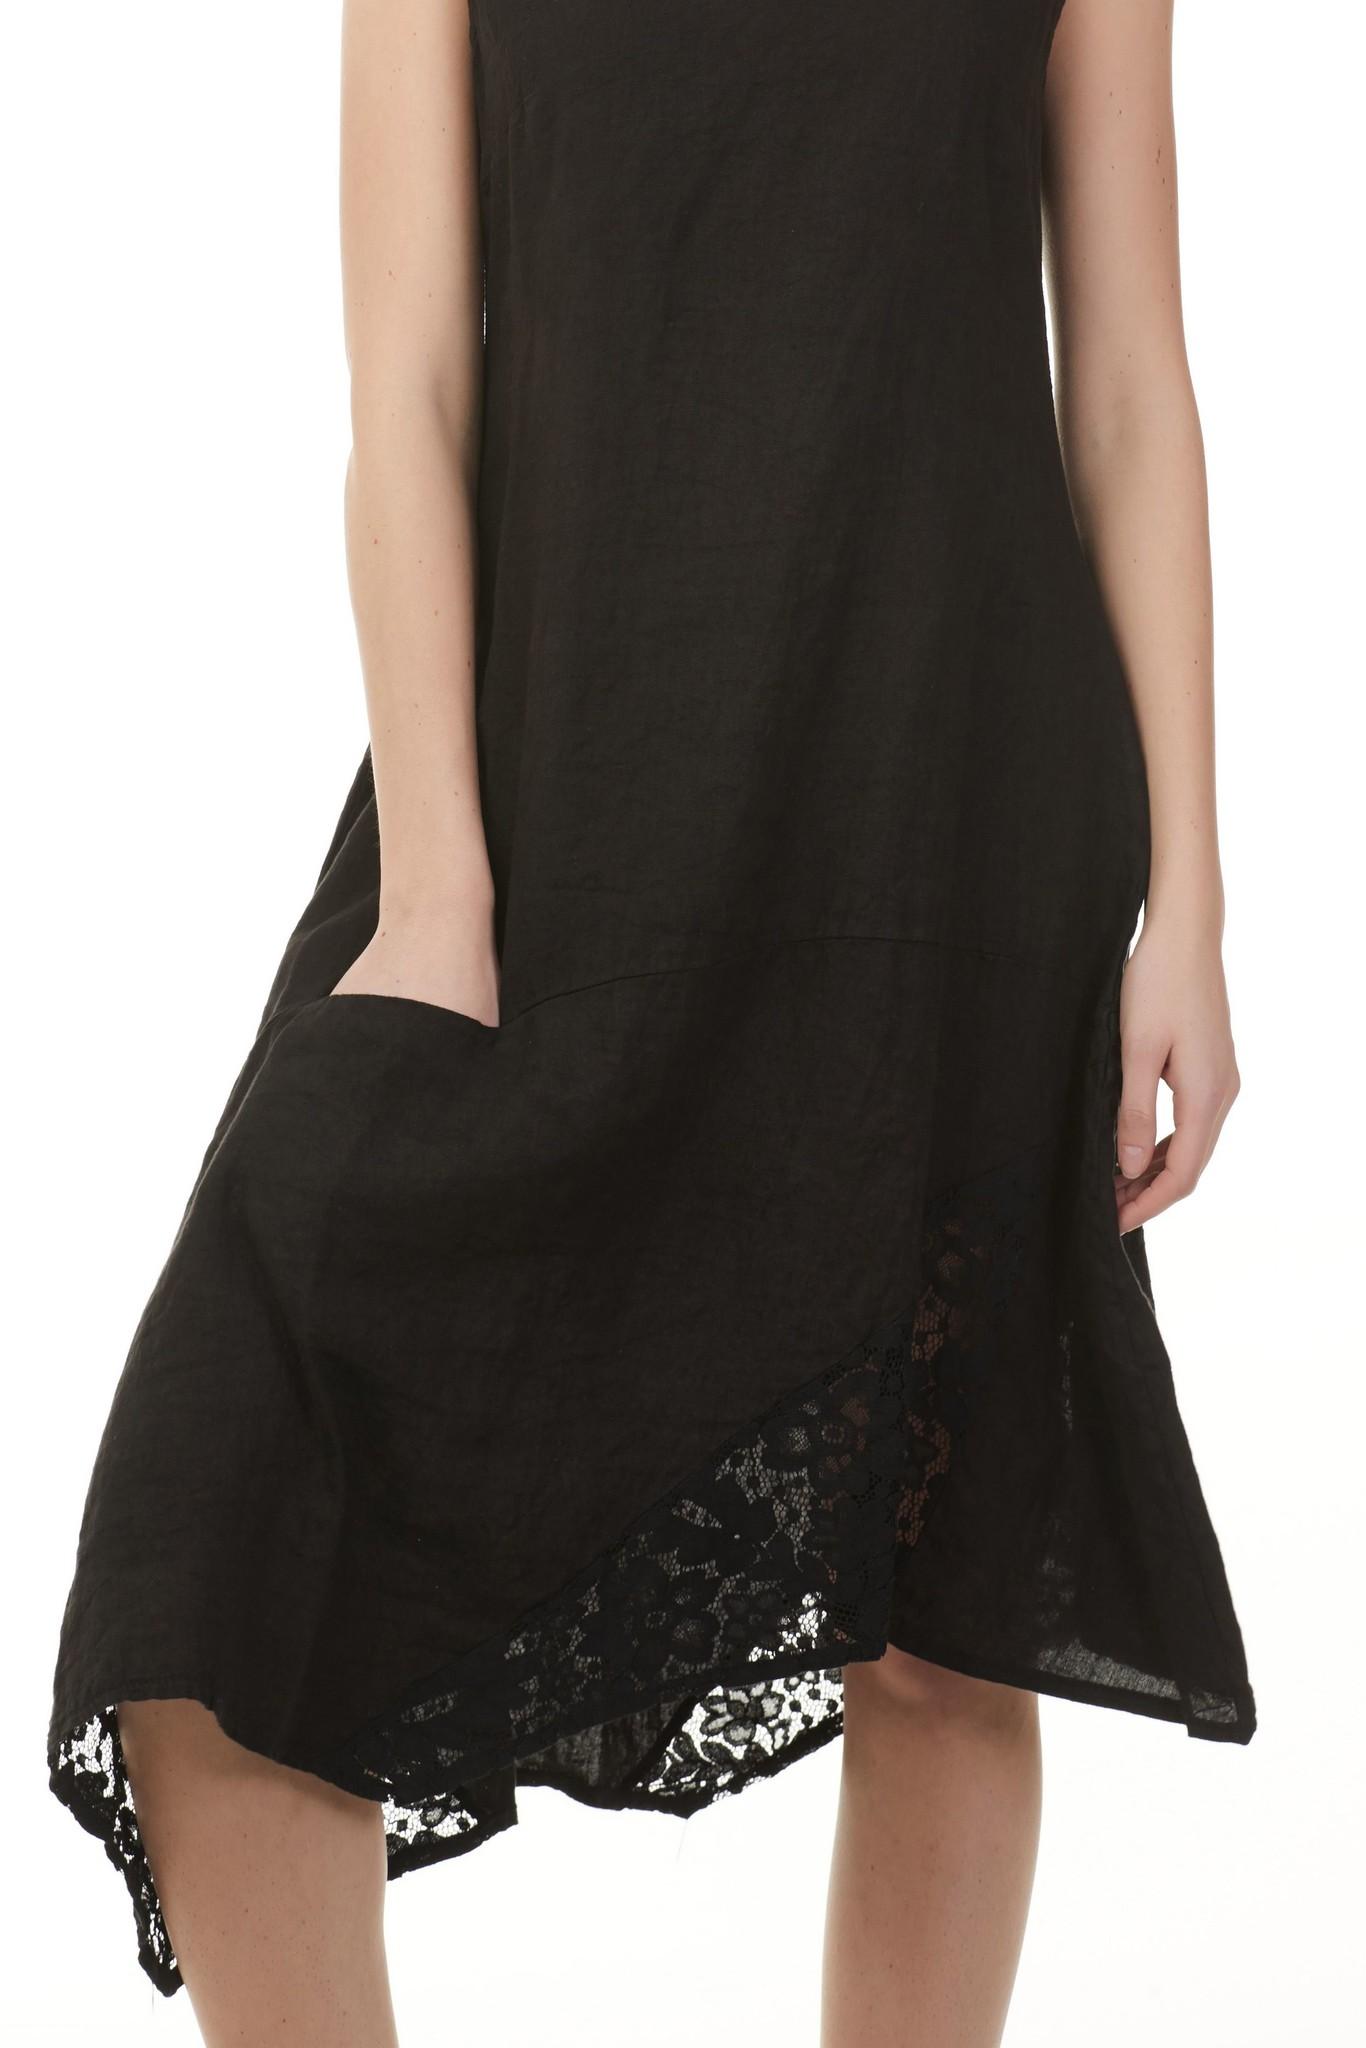 Charlie B Charlie B Asymetrical w Lace Dress - Black